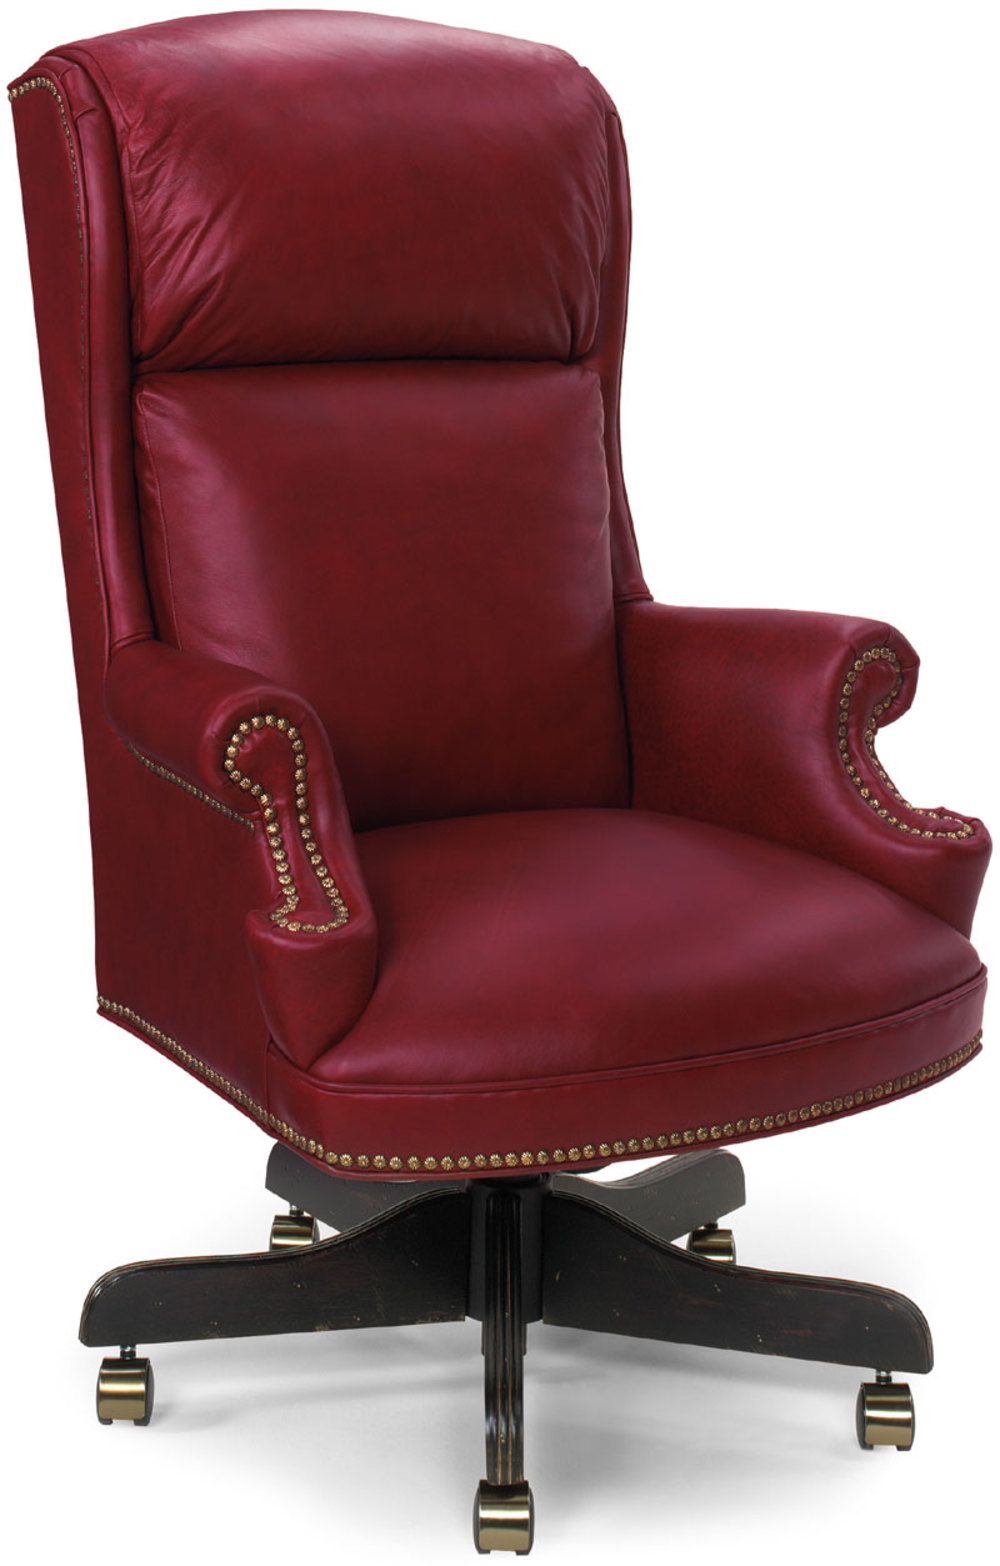 Parker Southern - Reagan Tilt Swivel Chair